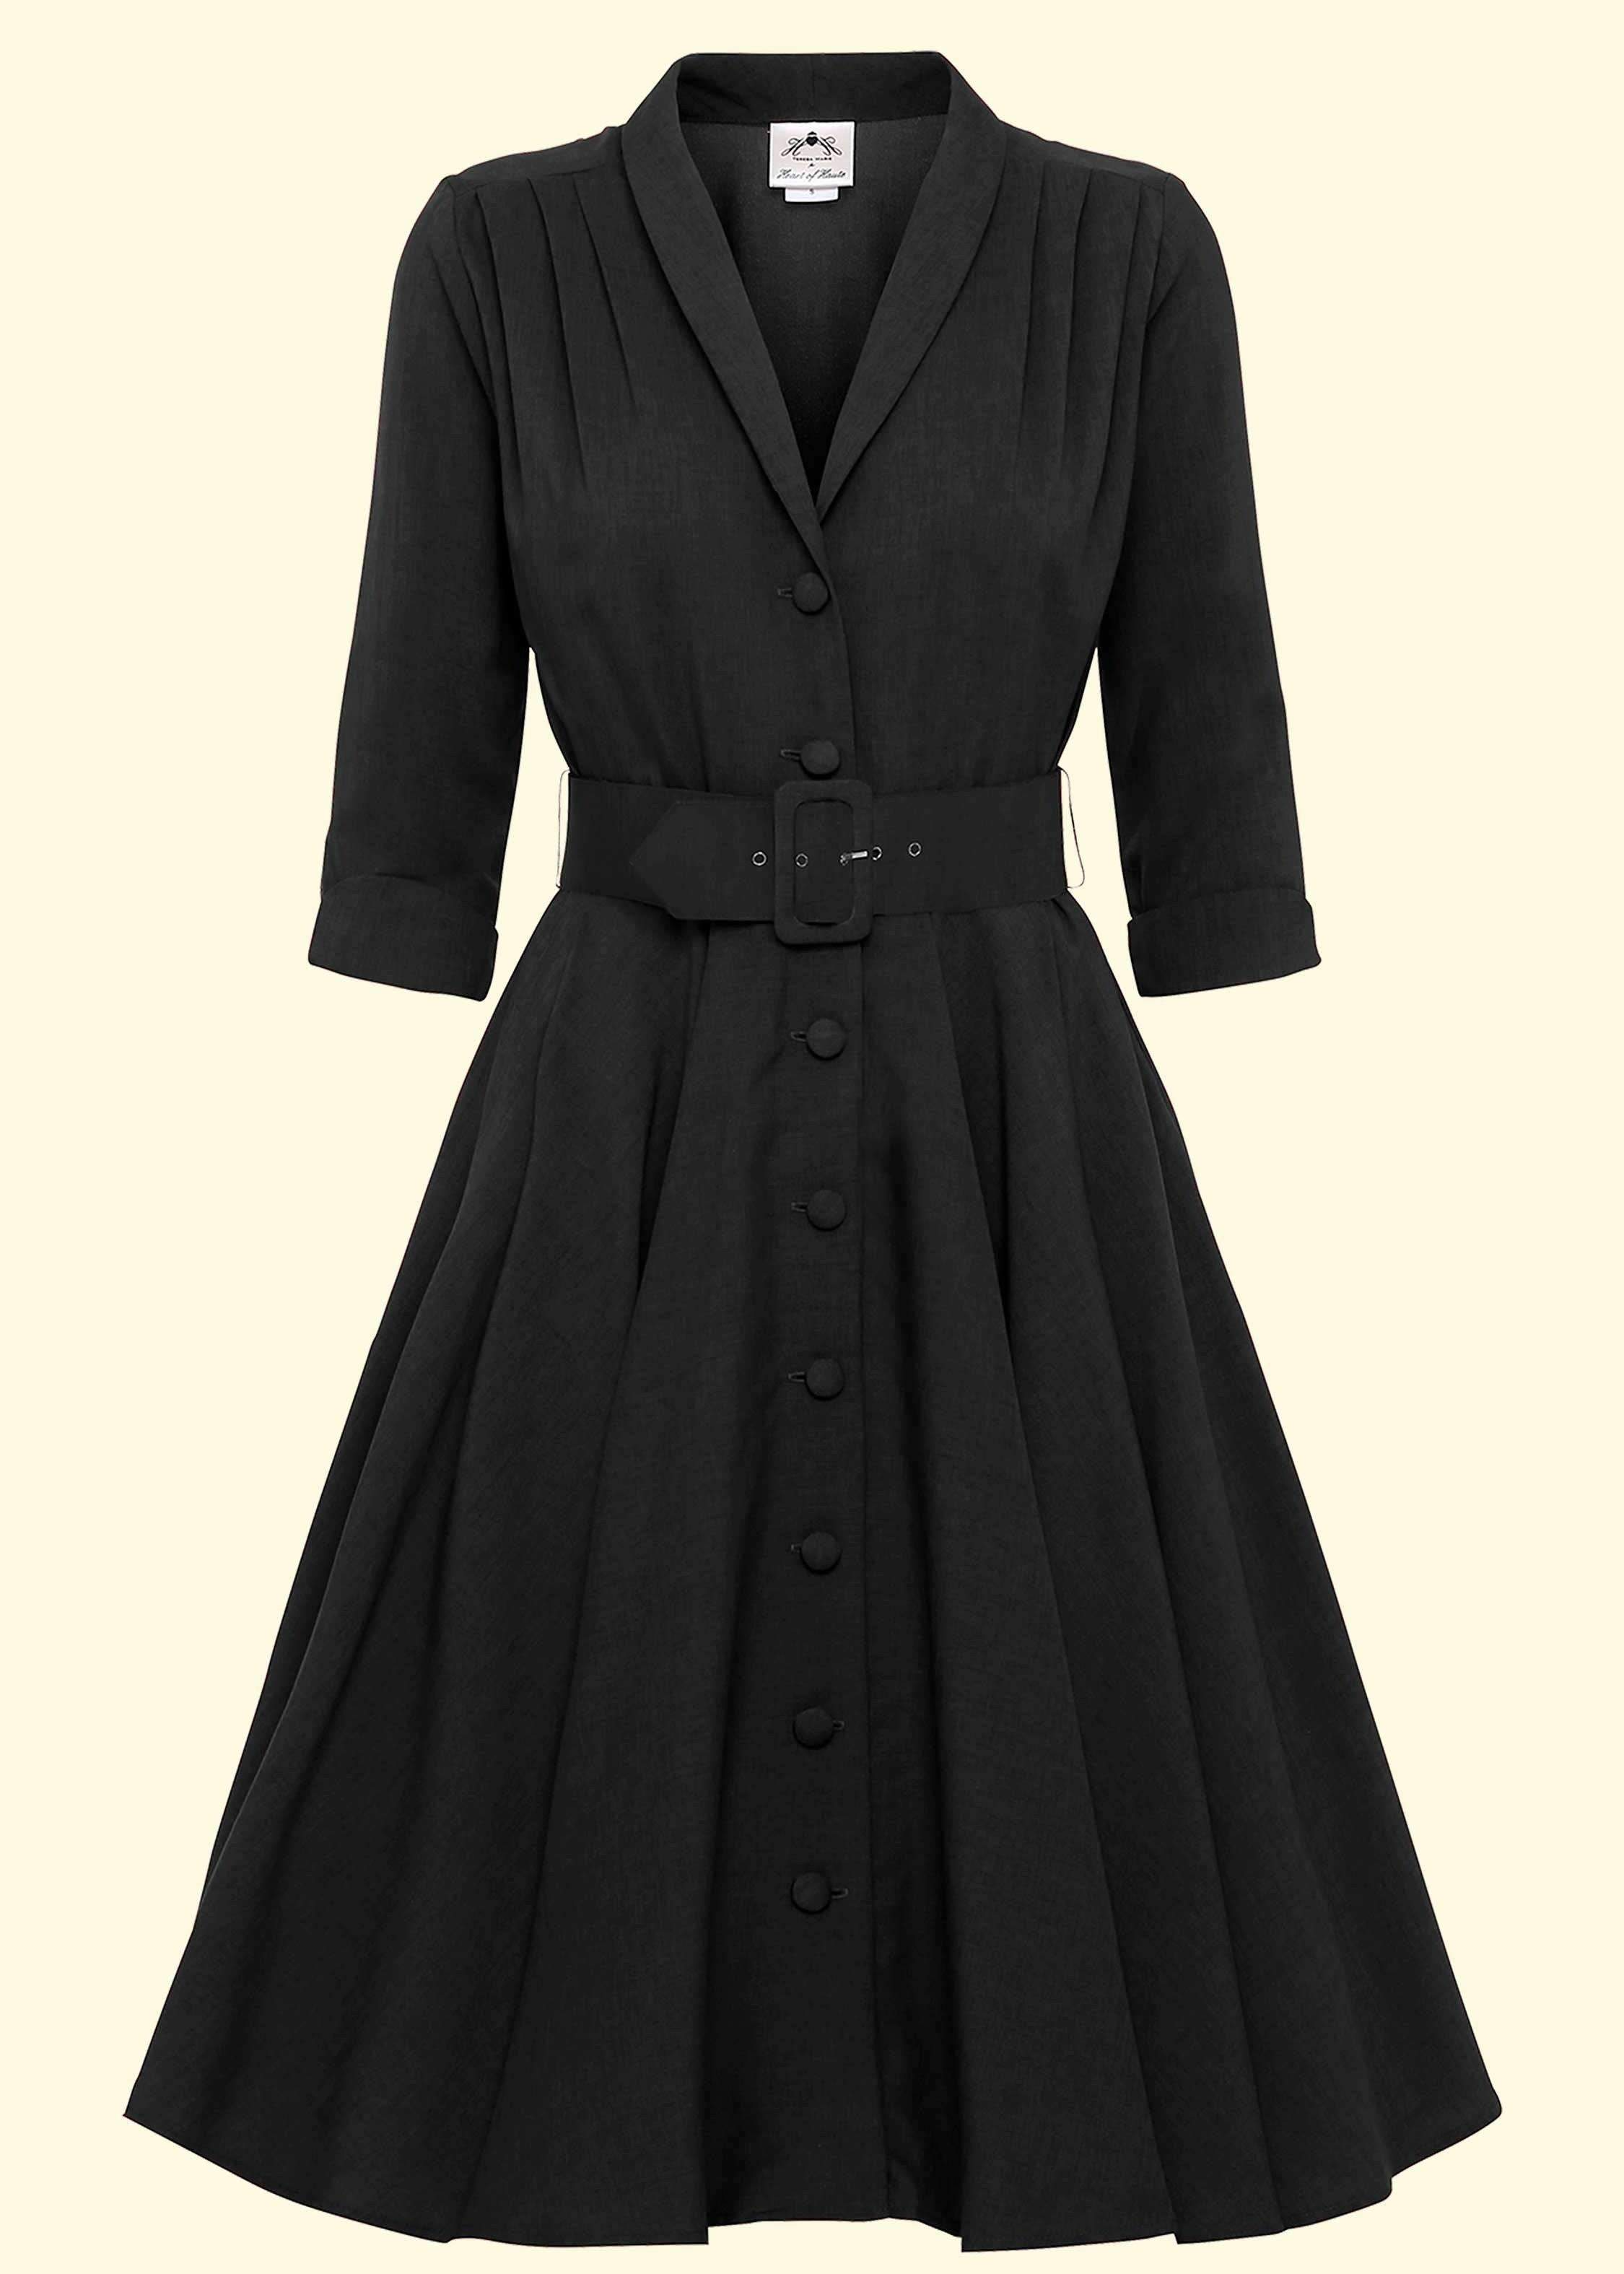 Shirt dress swing style black